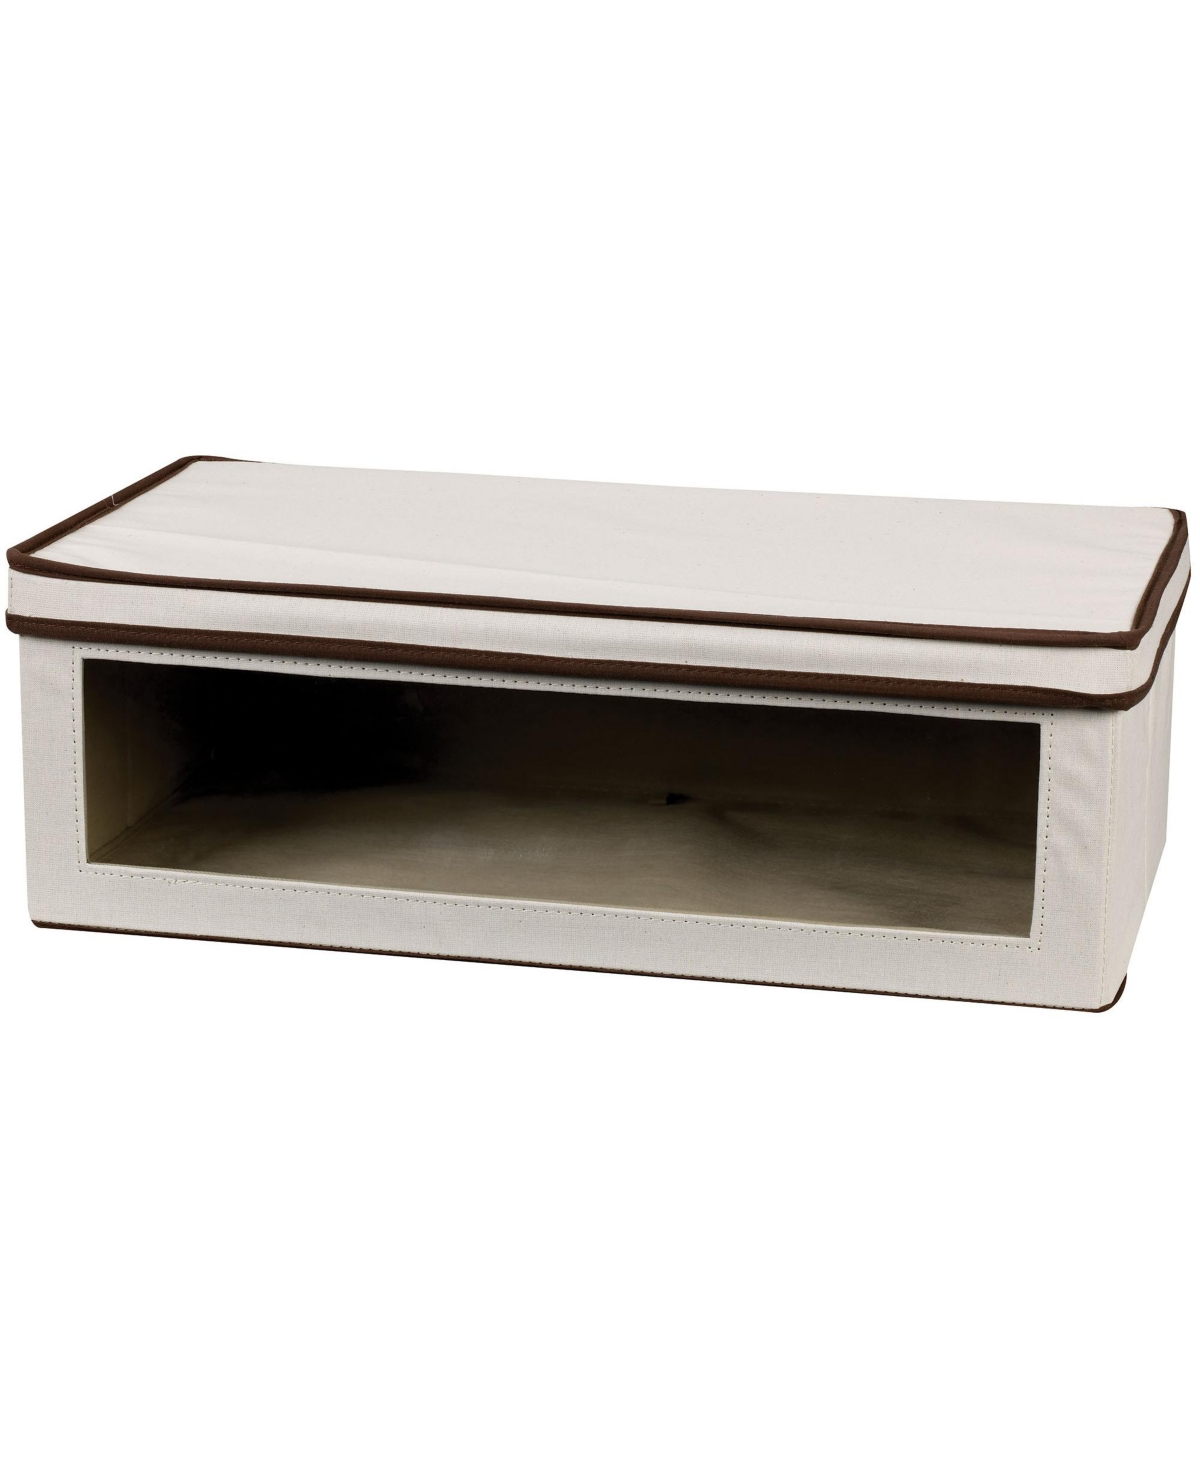 Household Essentials Large Canvas Storage Box